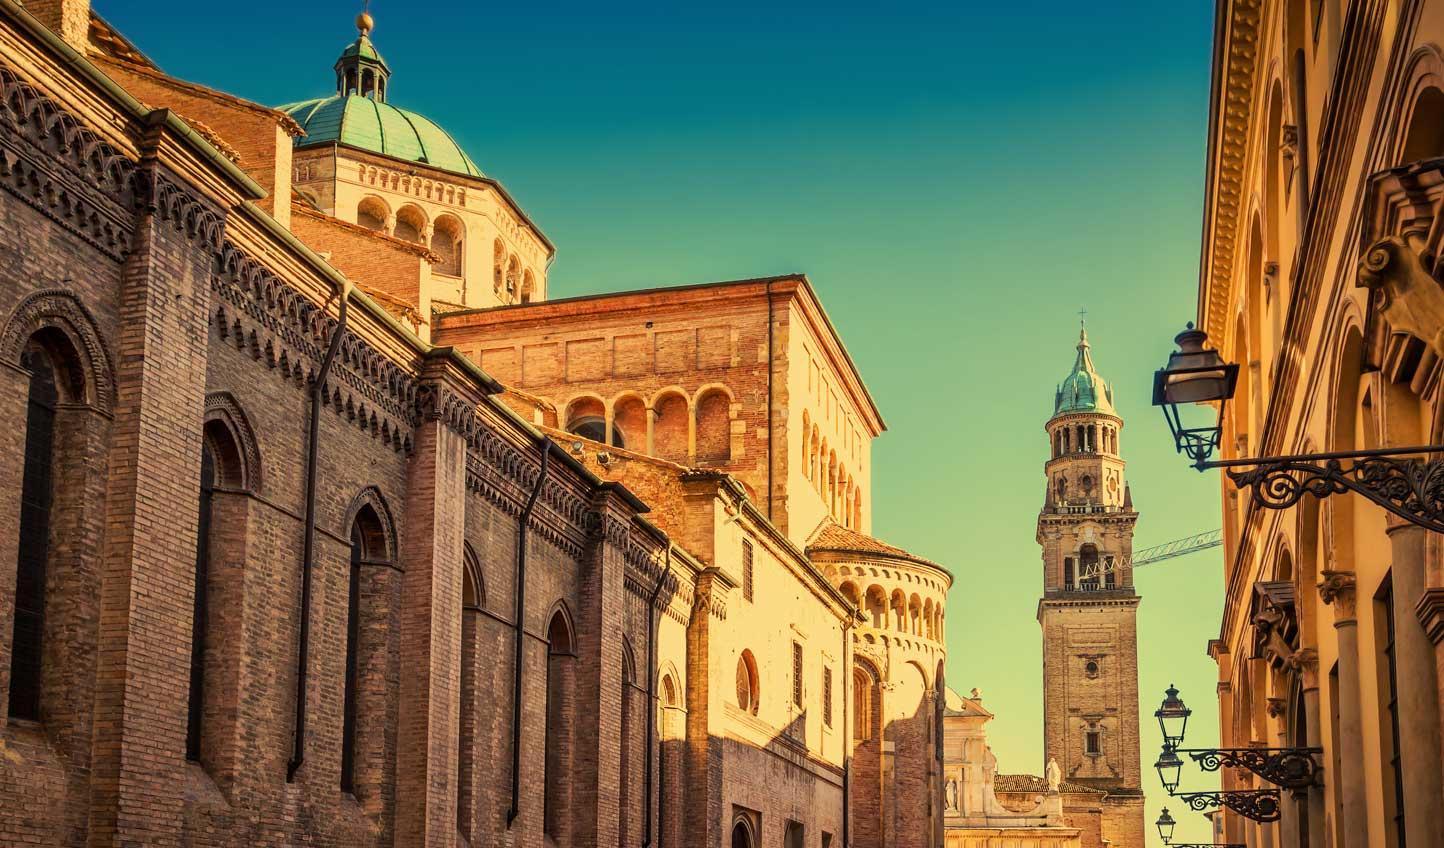 Save time to take in Parma's impressive architecture